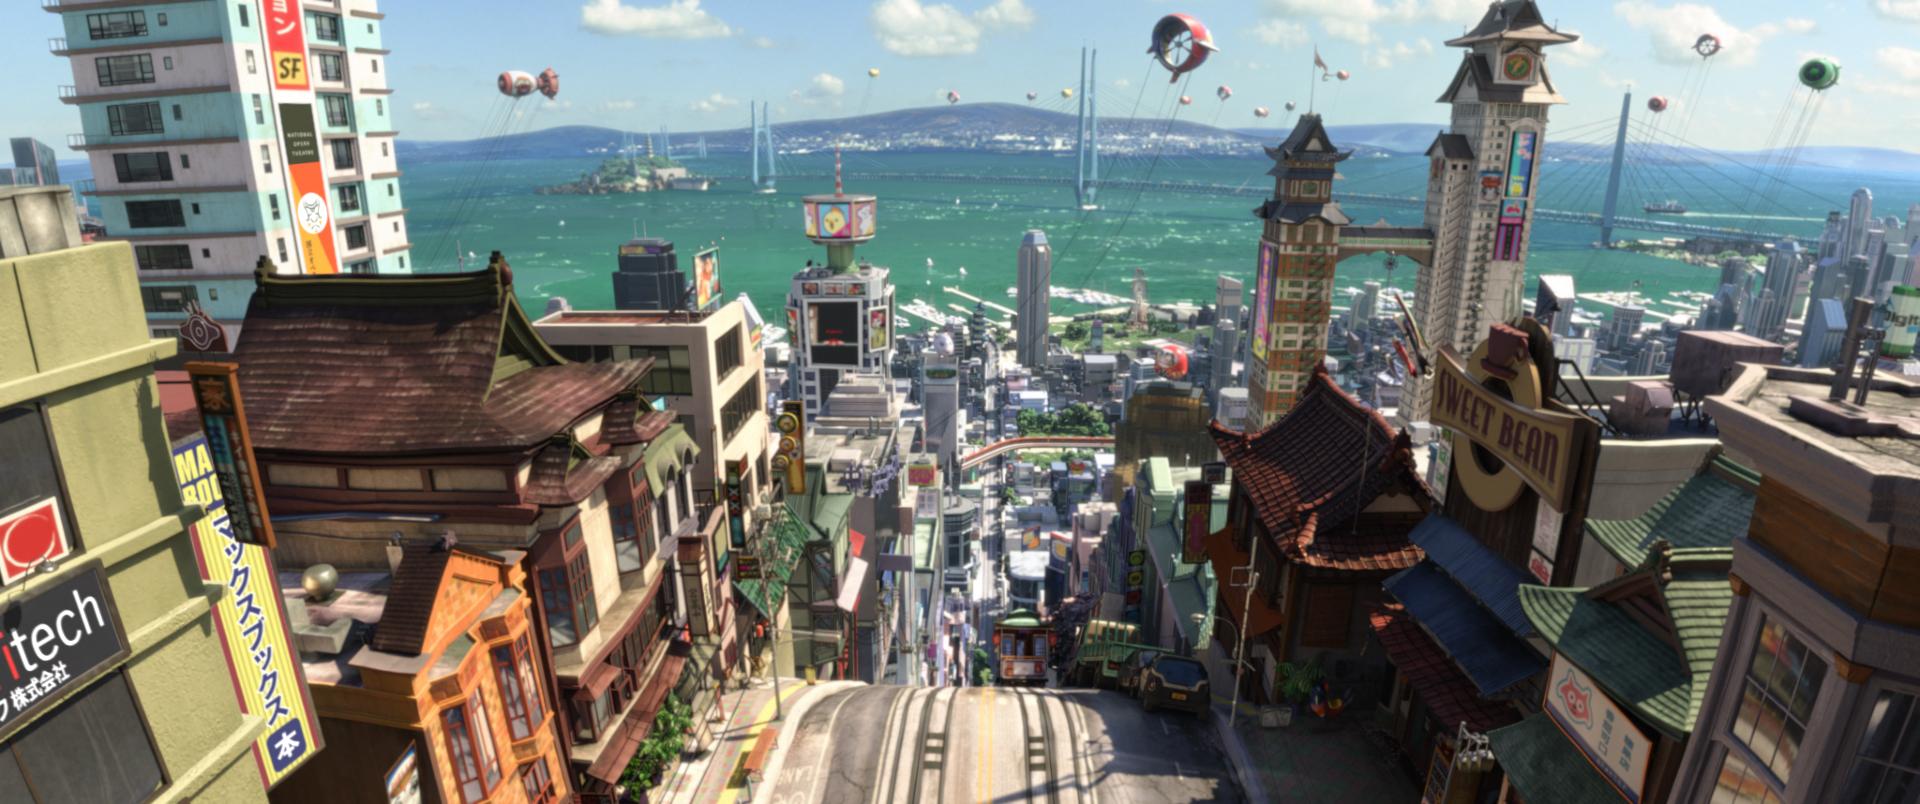 Una scena tratta dal film Disney-Pixar 'Big Hero 6'